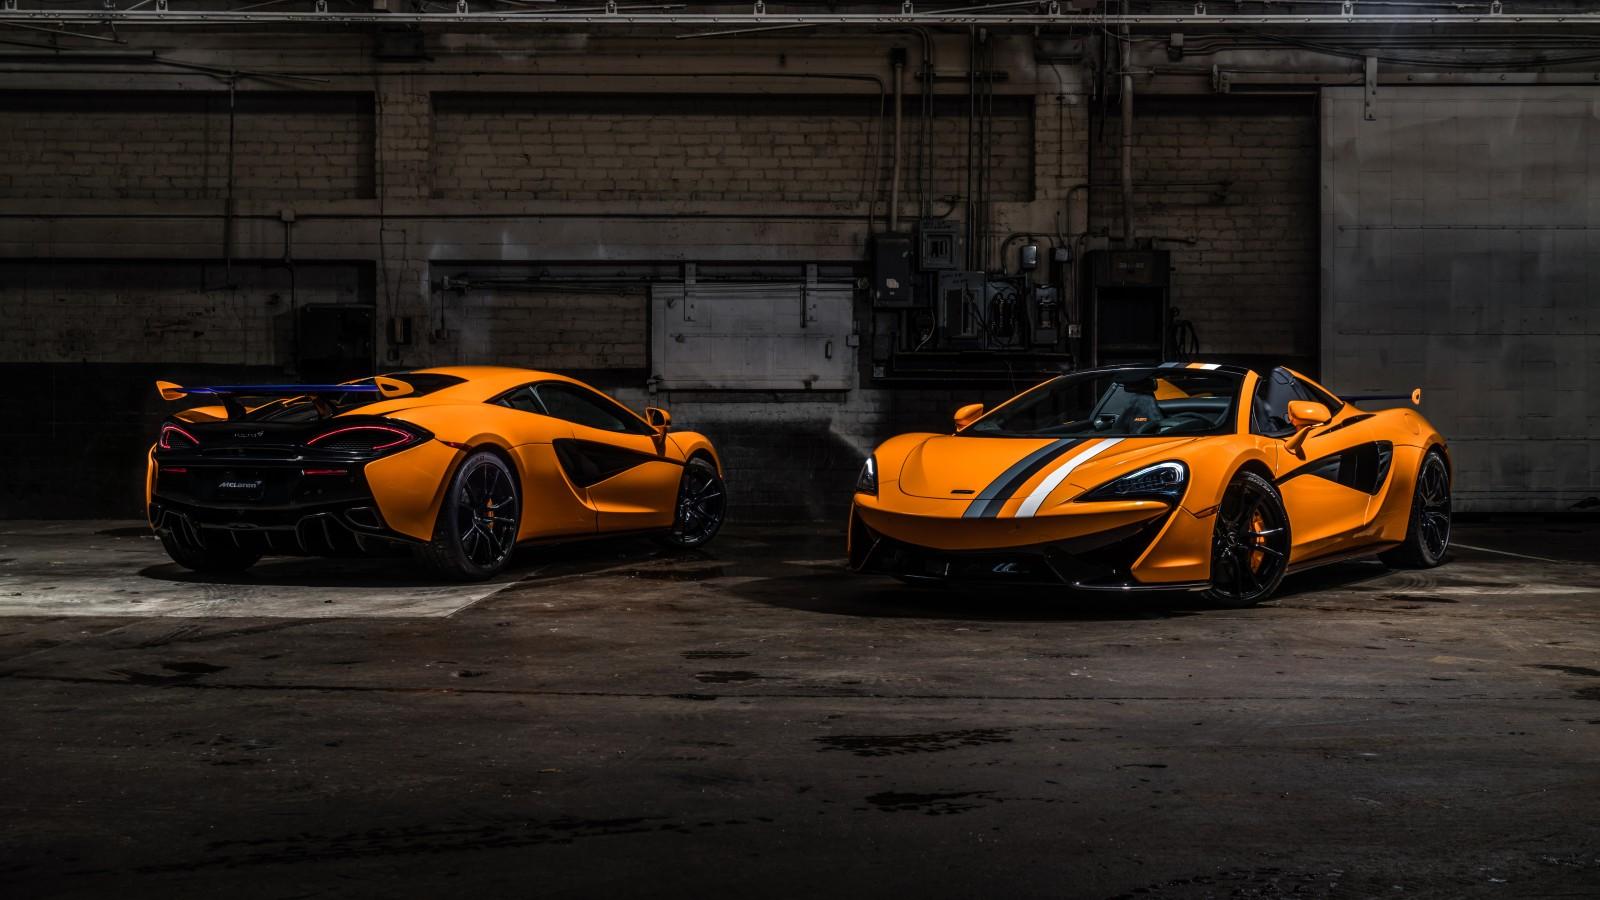 McLaren MSO 570S Spider Papaya Spark 2019 4K 8K Wallpaper ...